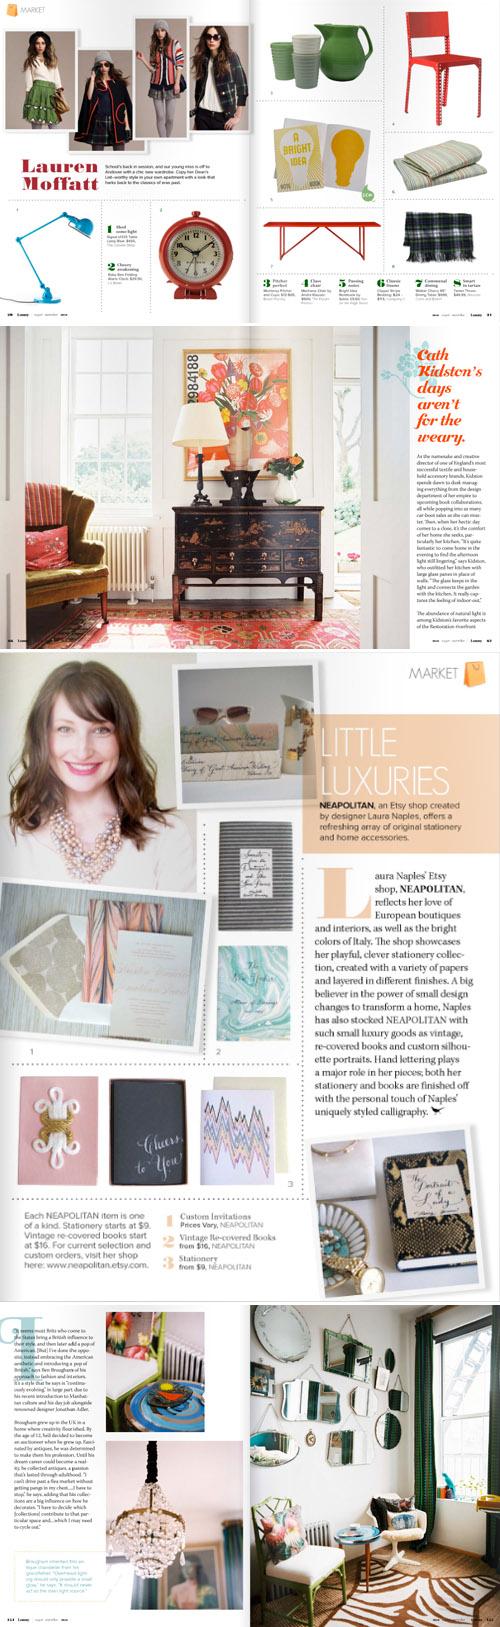 Home Decor Style Ideas from Lonny Magazine   Junebug Weddings